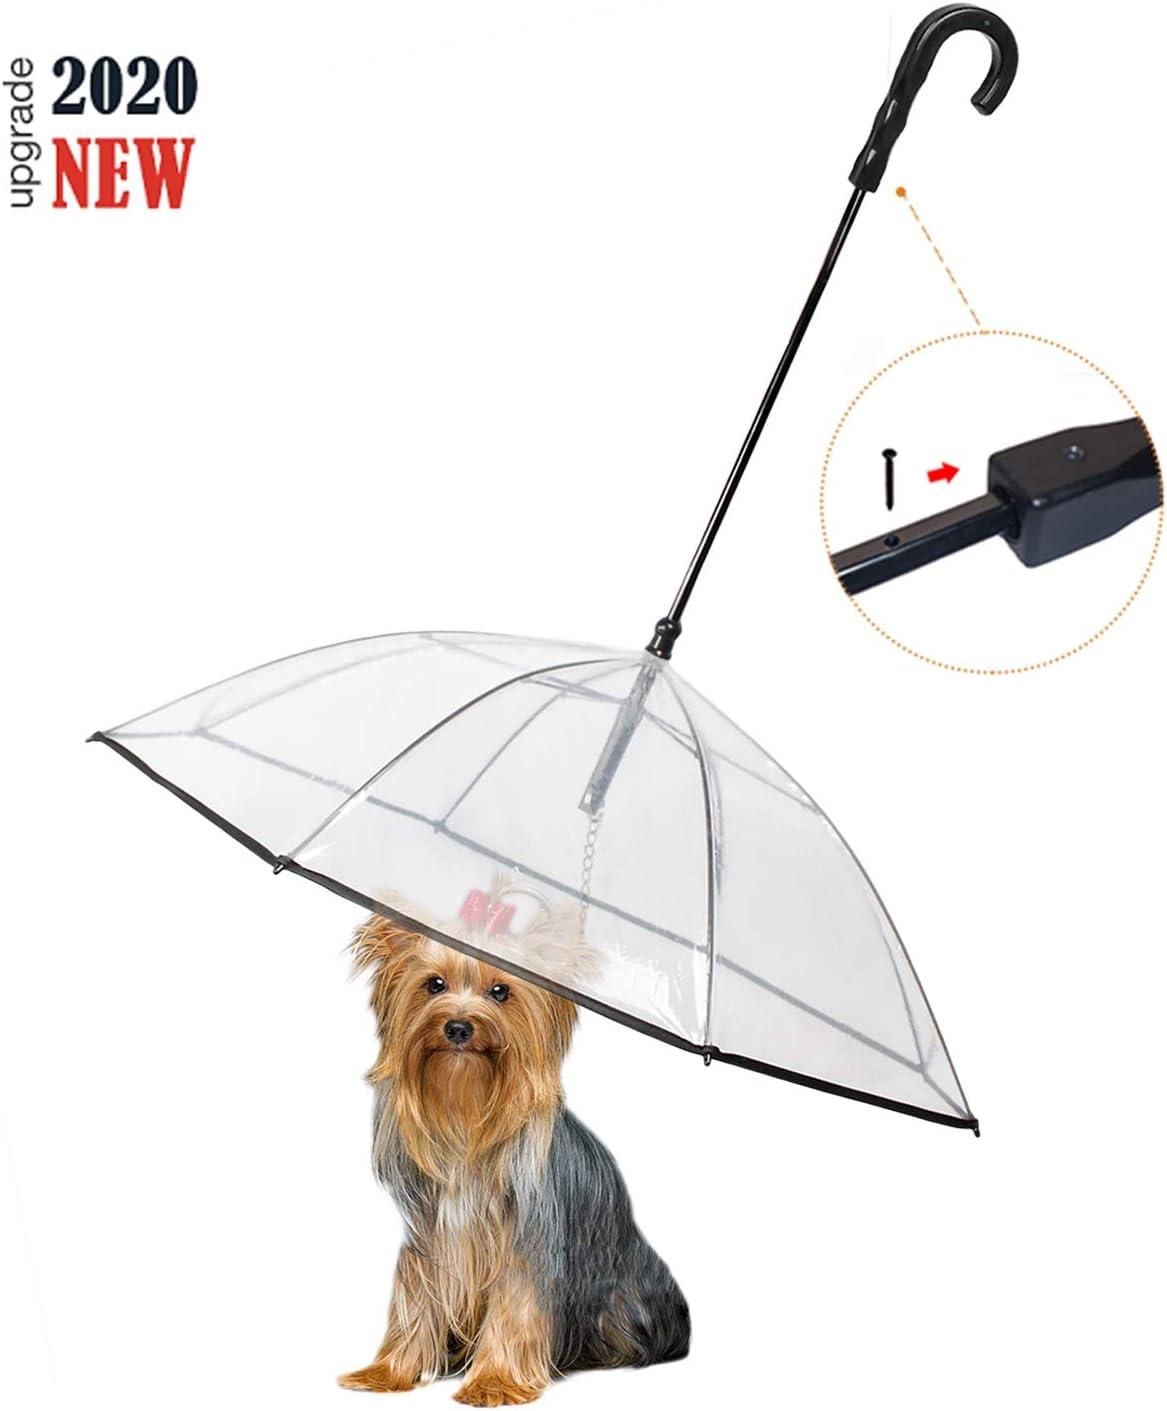 Best Dog umbrella with leash 4